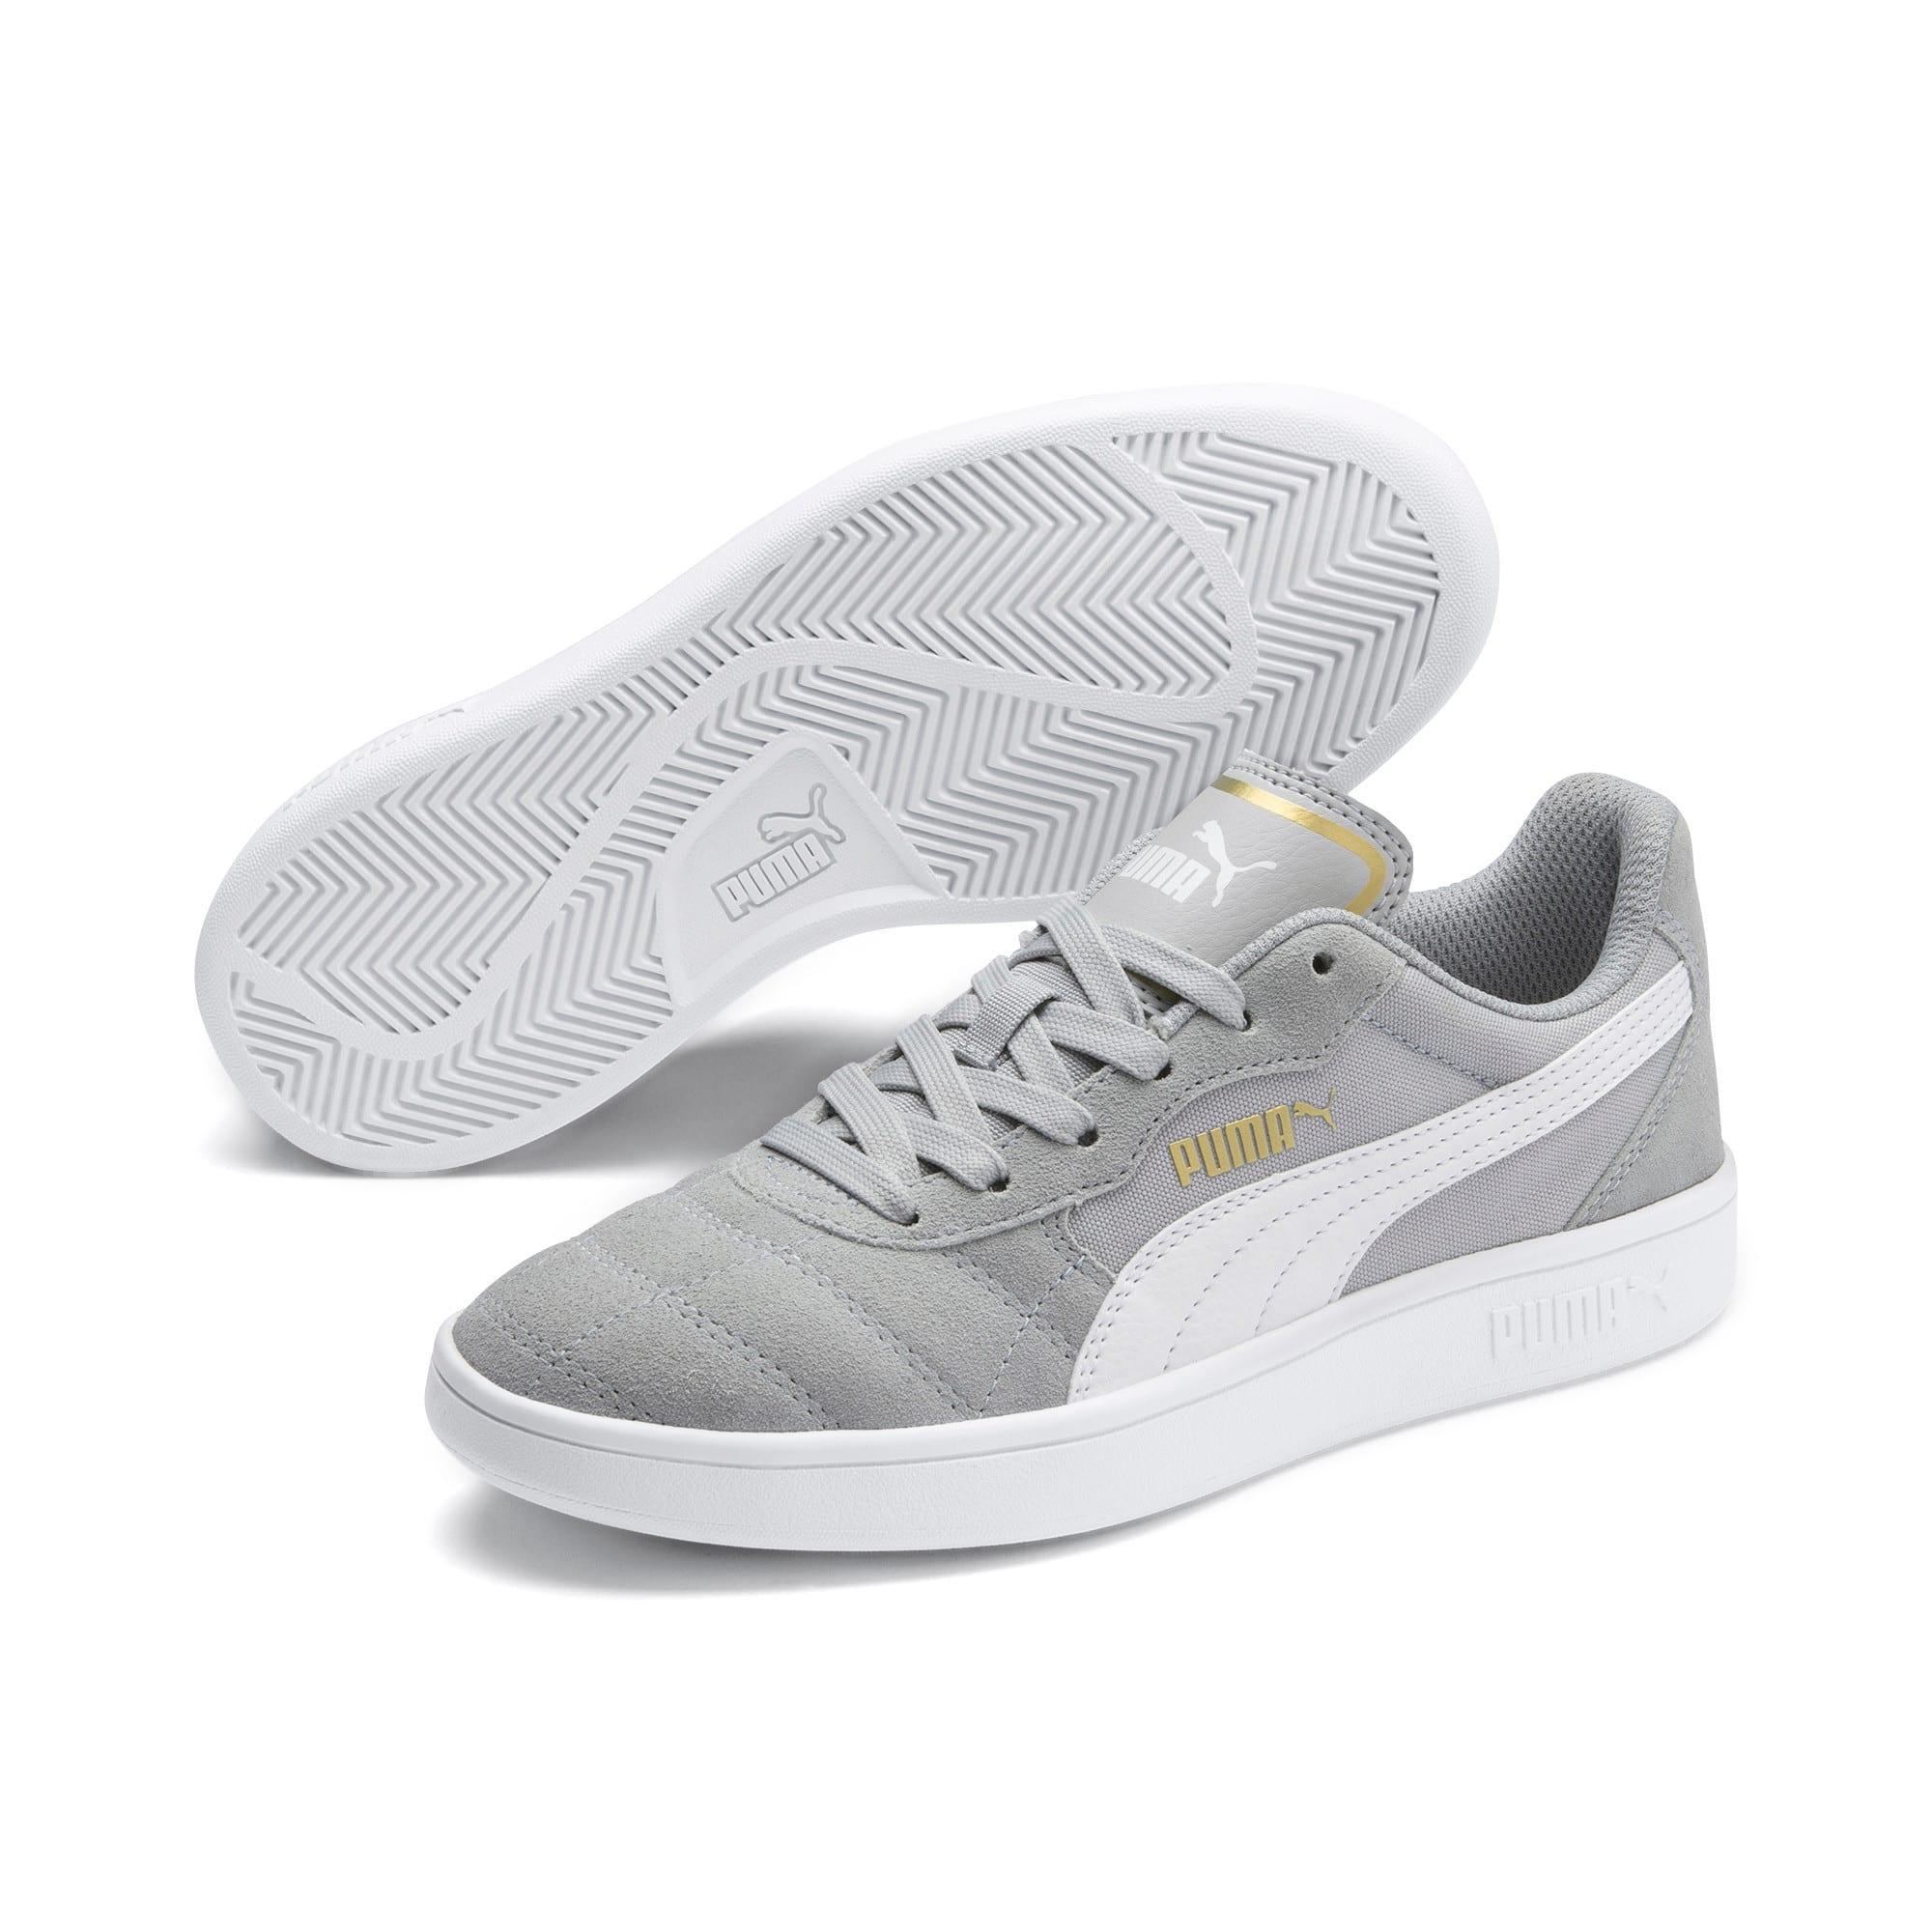 Thumbnail 2 of Astro Kick Sneakers JR, HRise-White-Gold-GViolet-Gum, medium